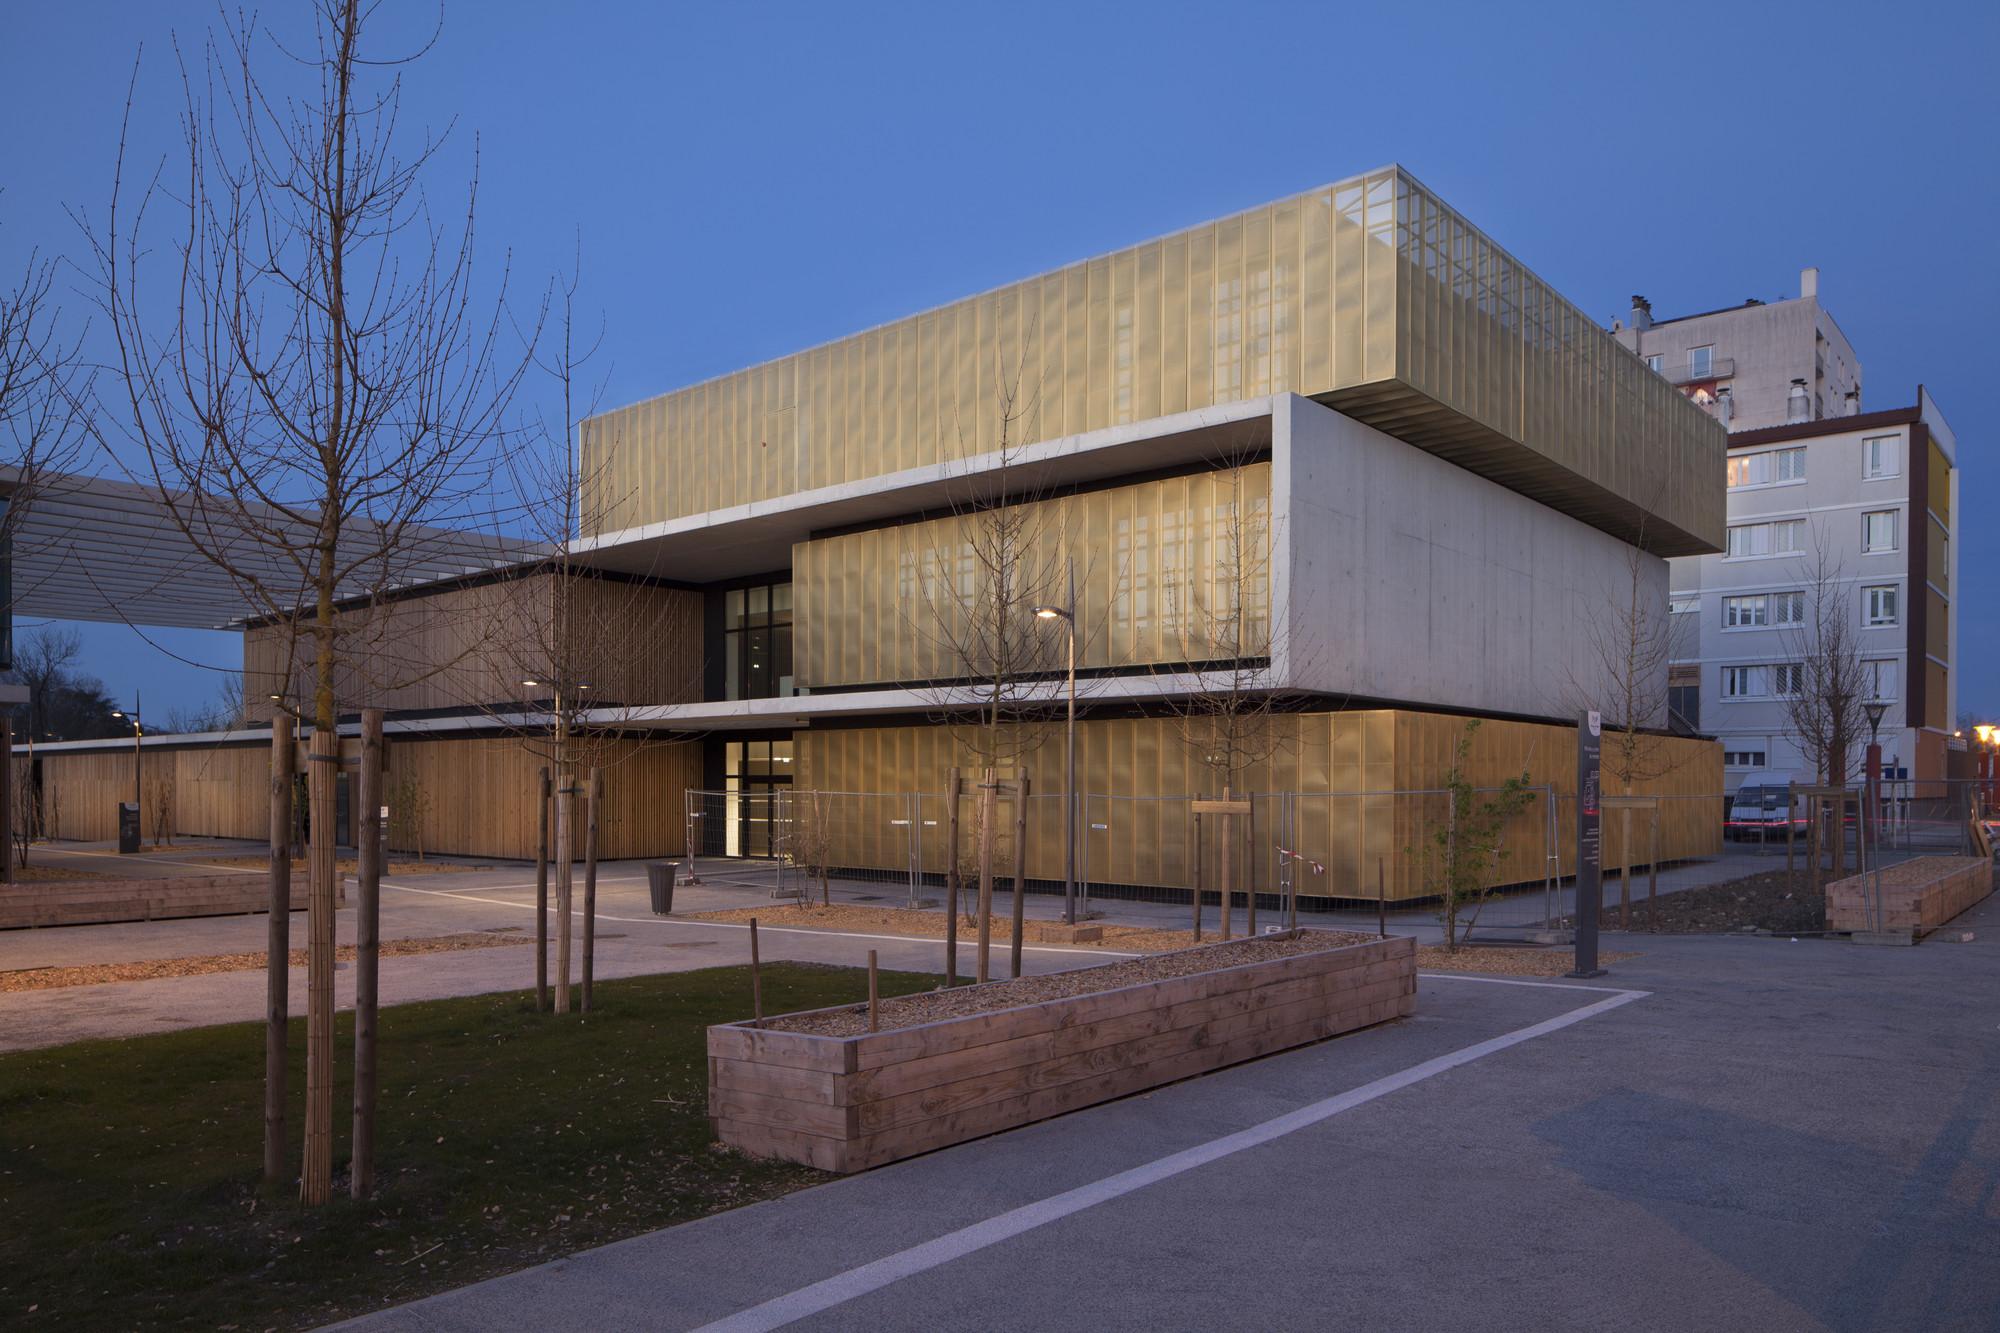 Centro Cultural, Educativo y Escuela / Marjan Hessamfar & Joe Vérons Architectes